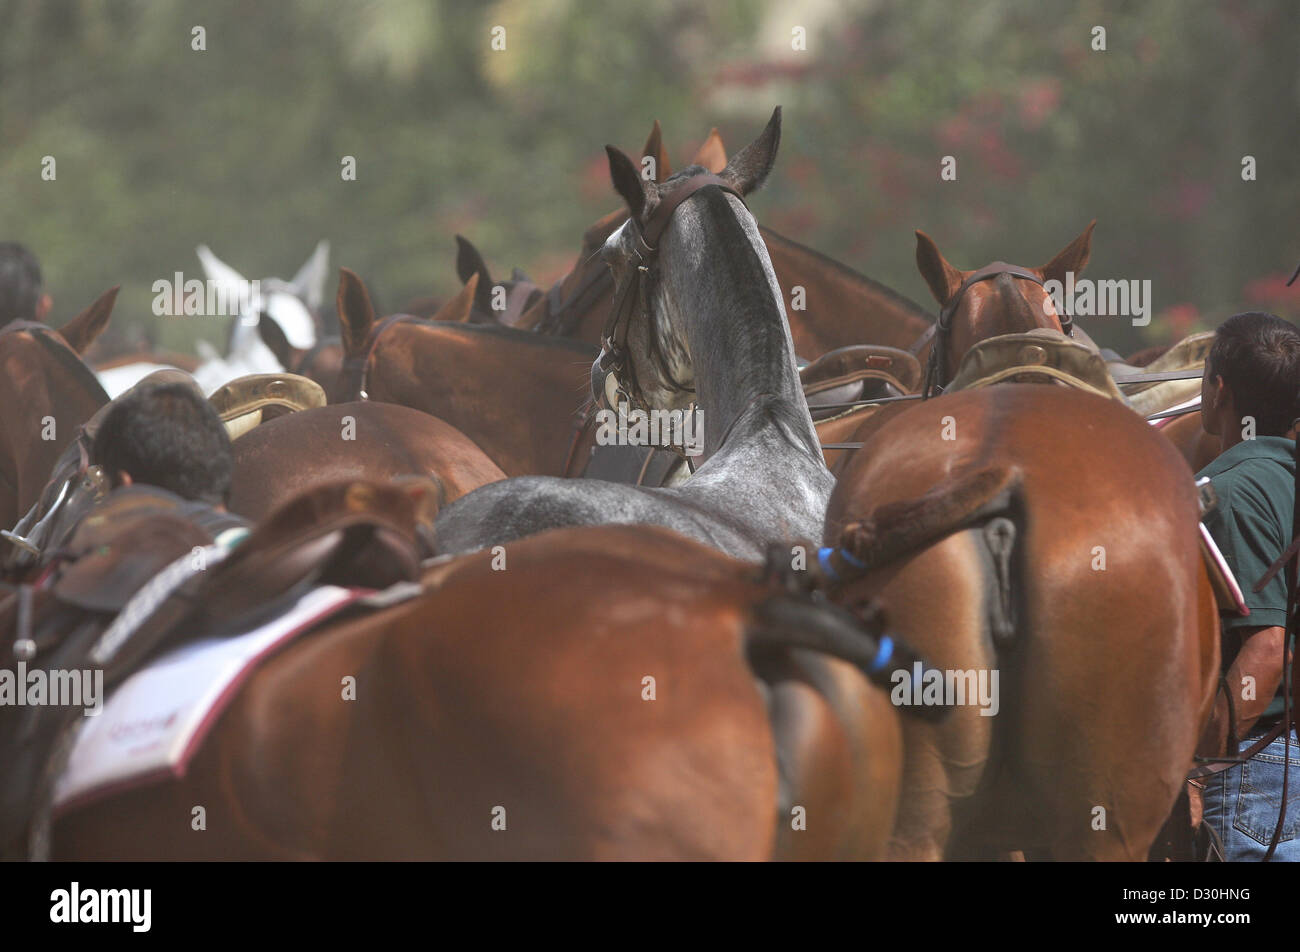 Dubai, United Arab Emirates, a group of polo horses - Stock Image